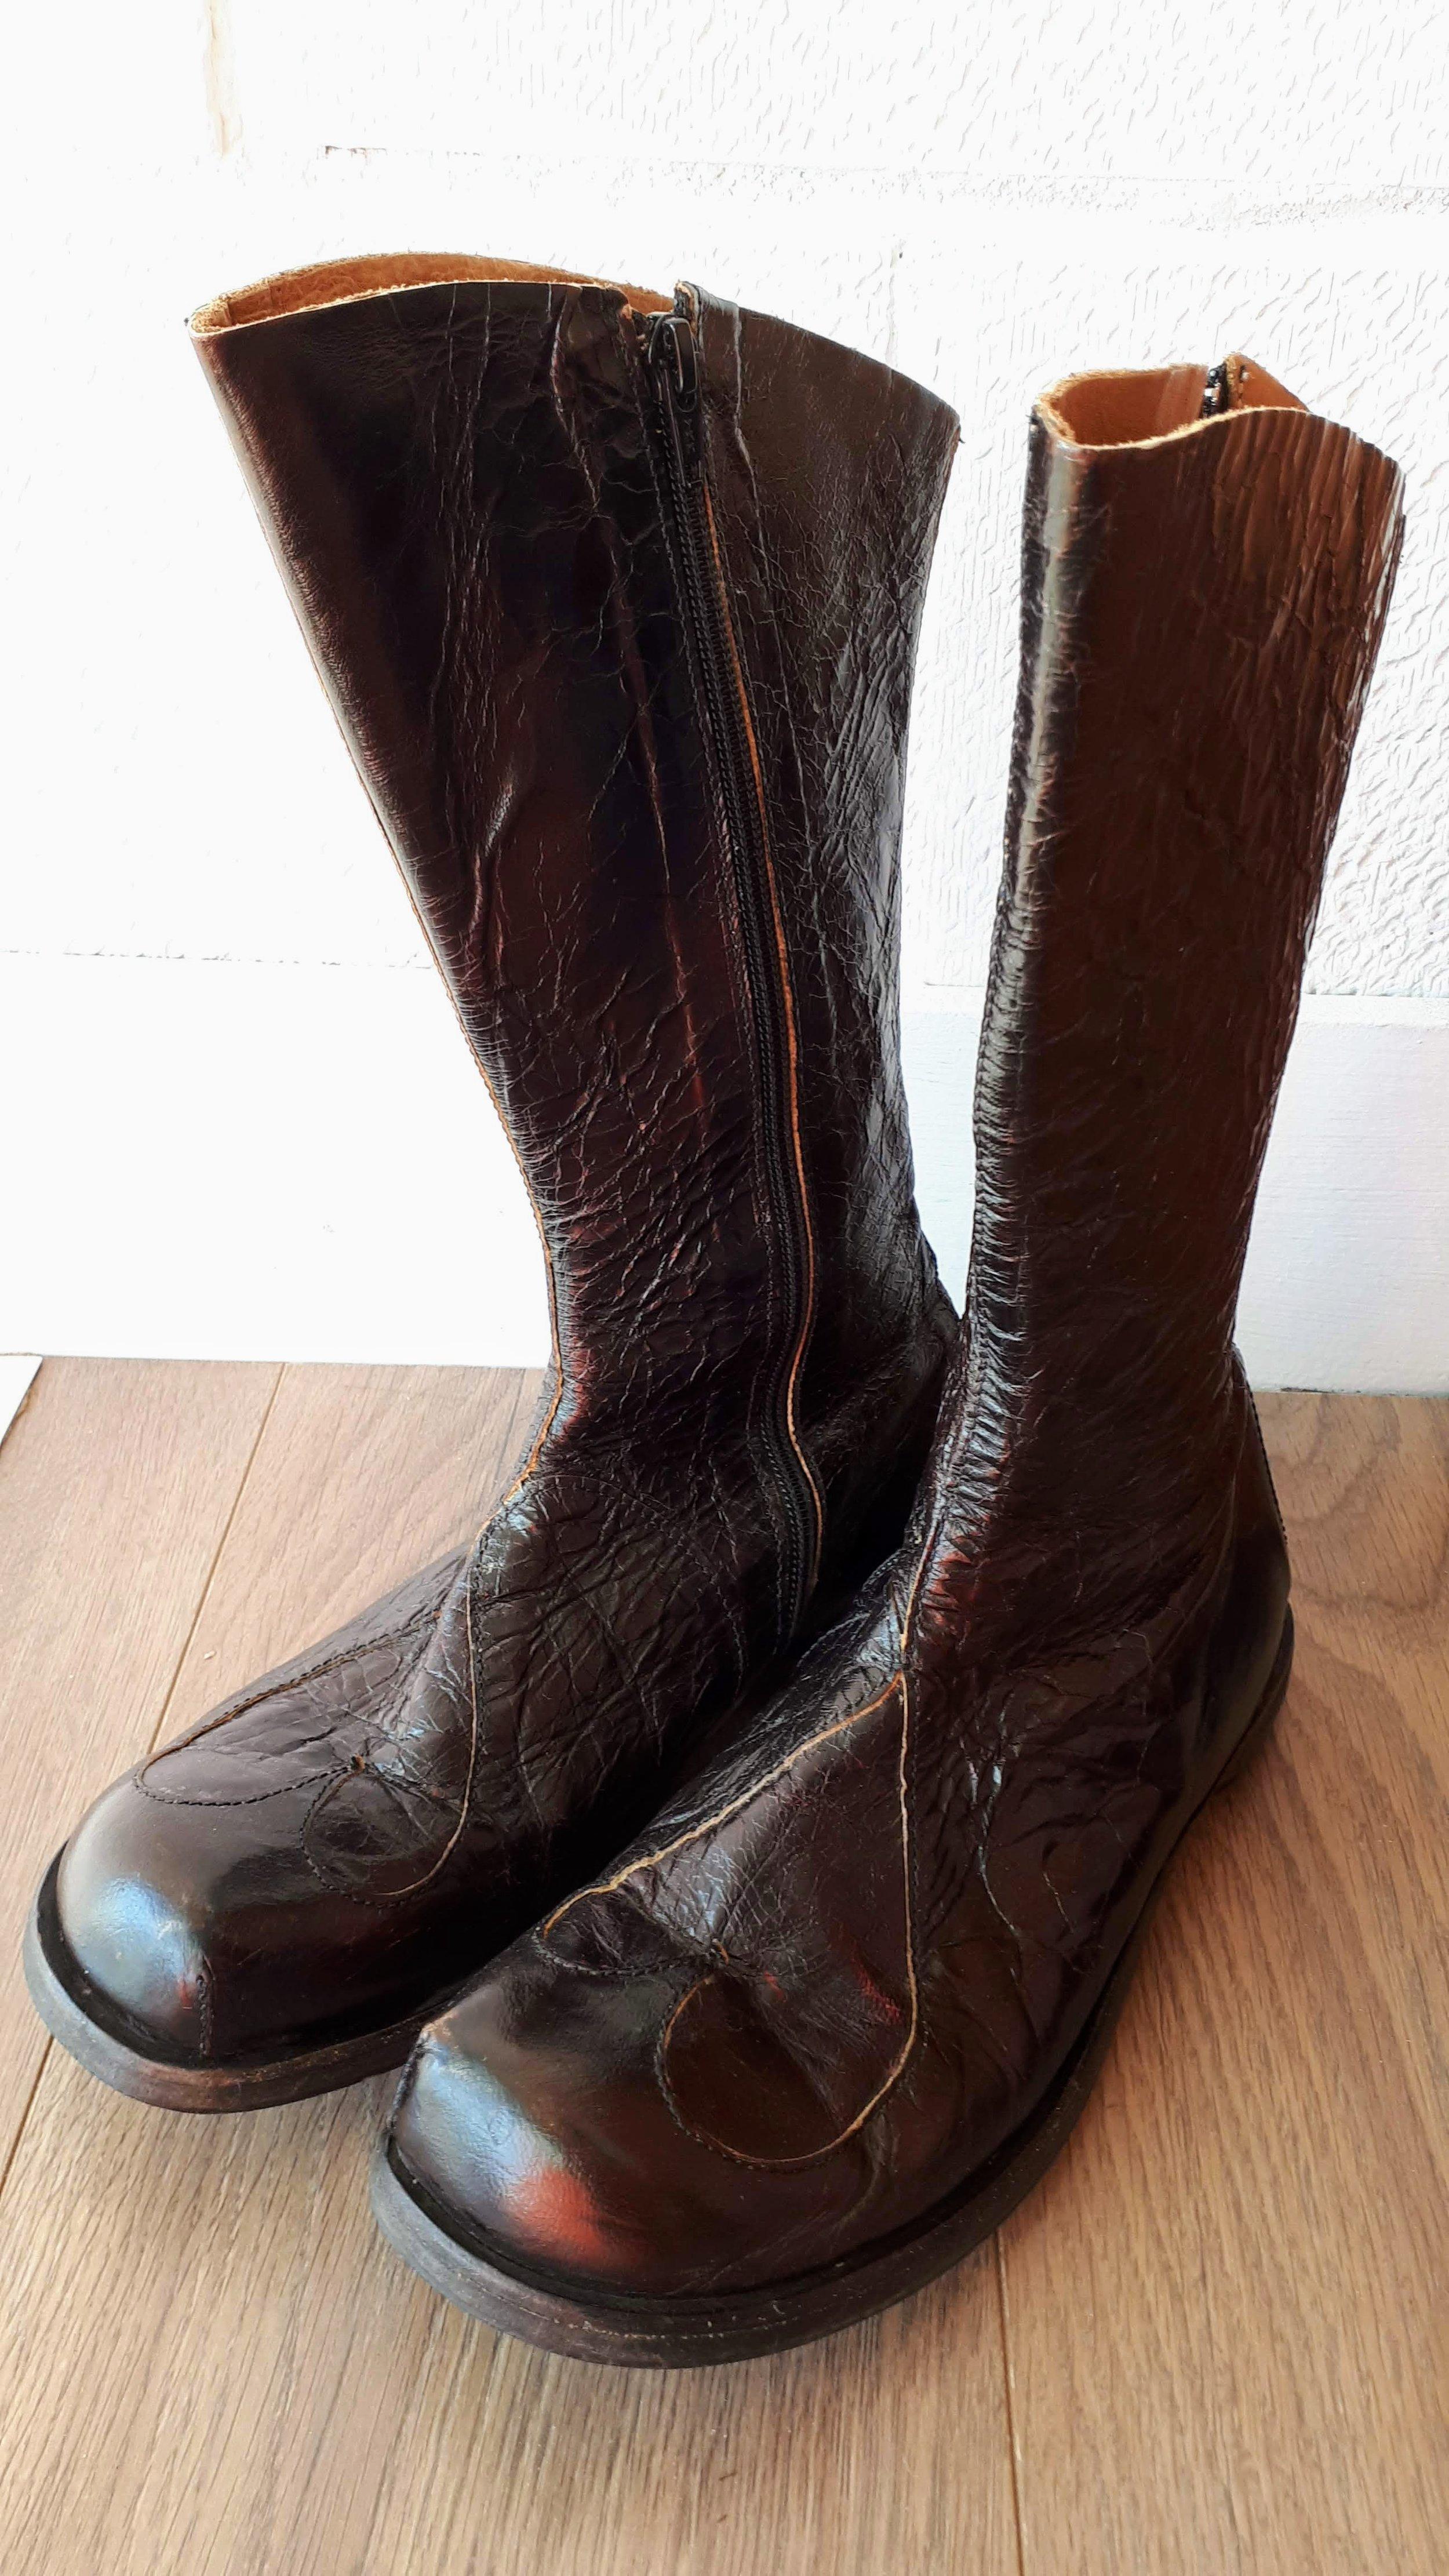 Cydwoq boots; S9, $195